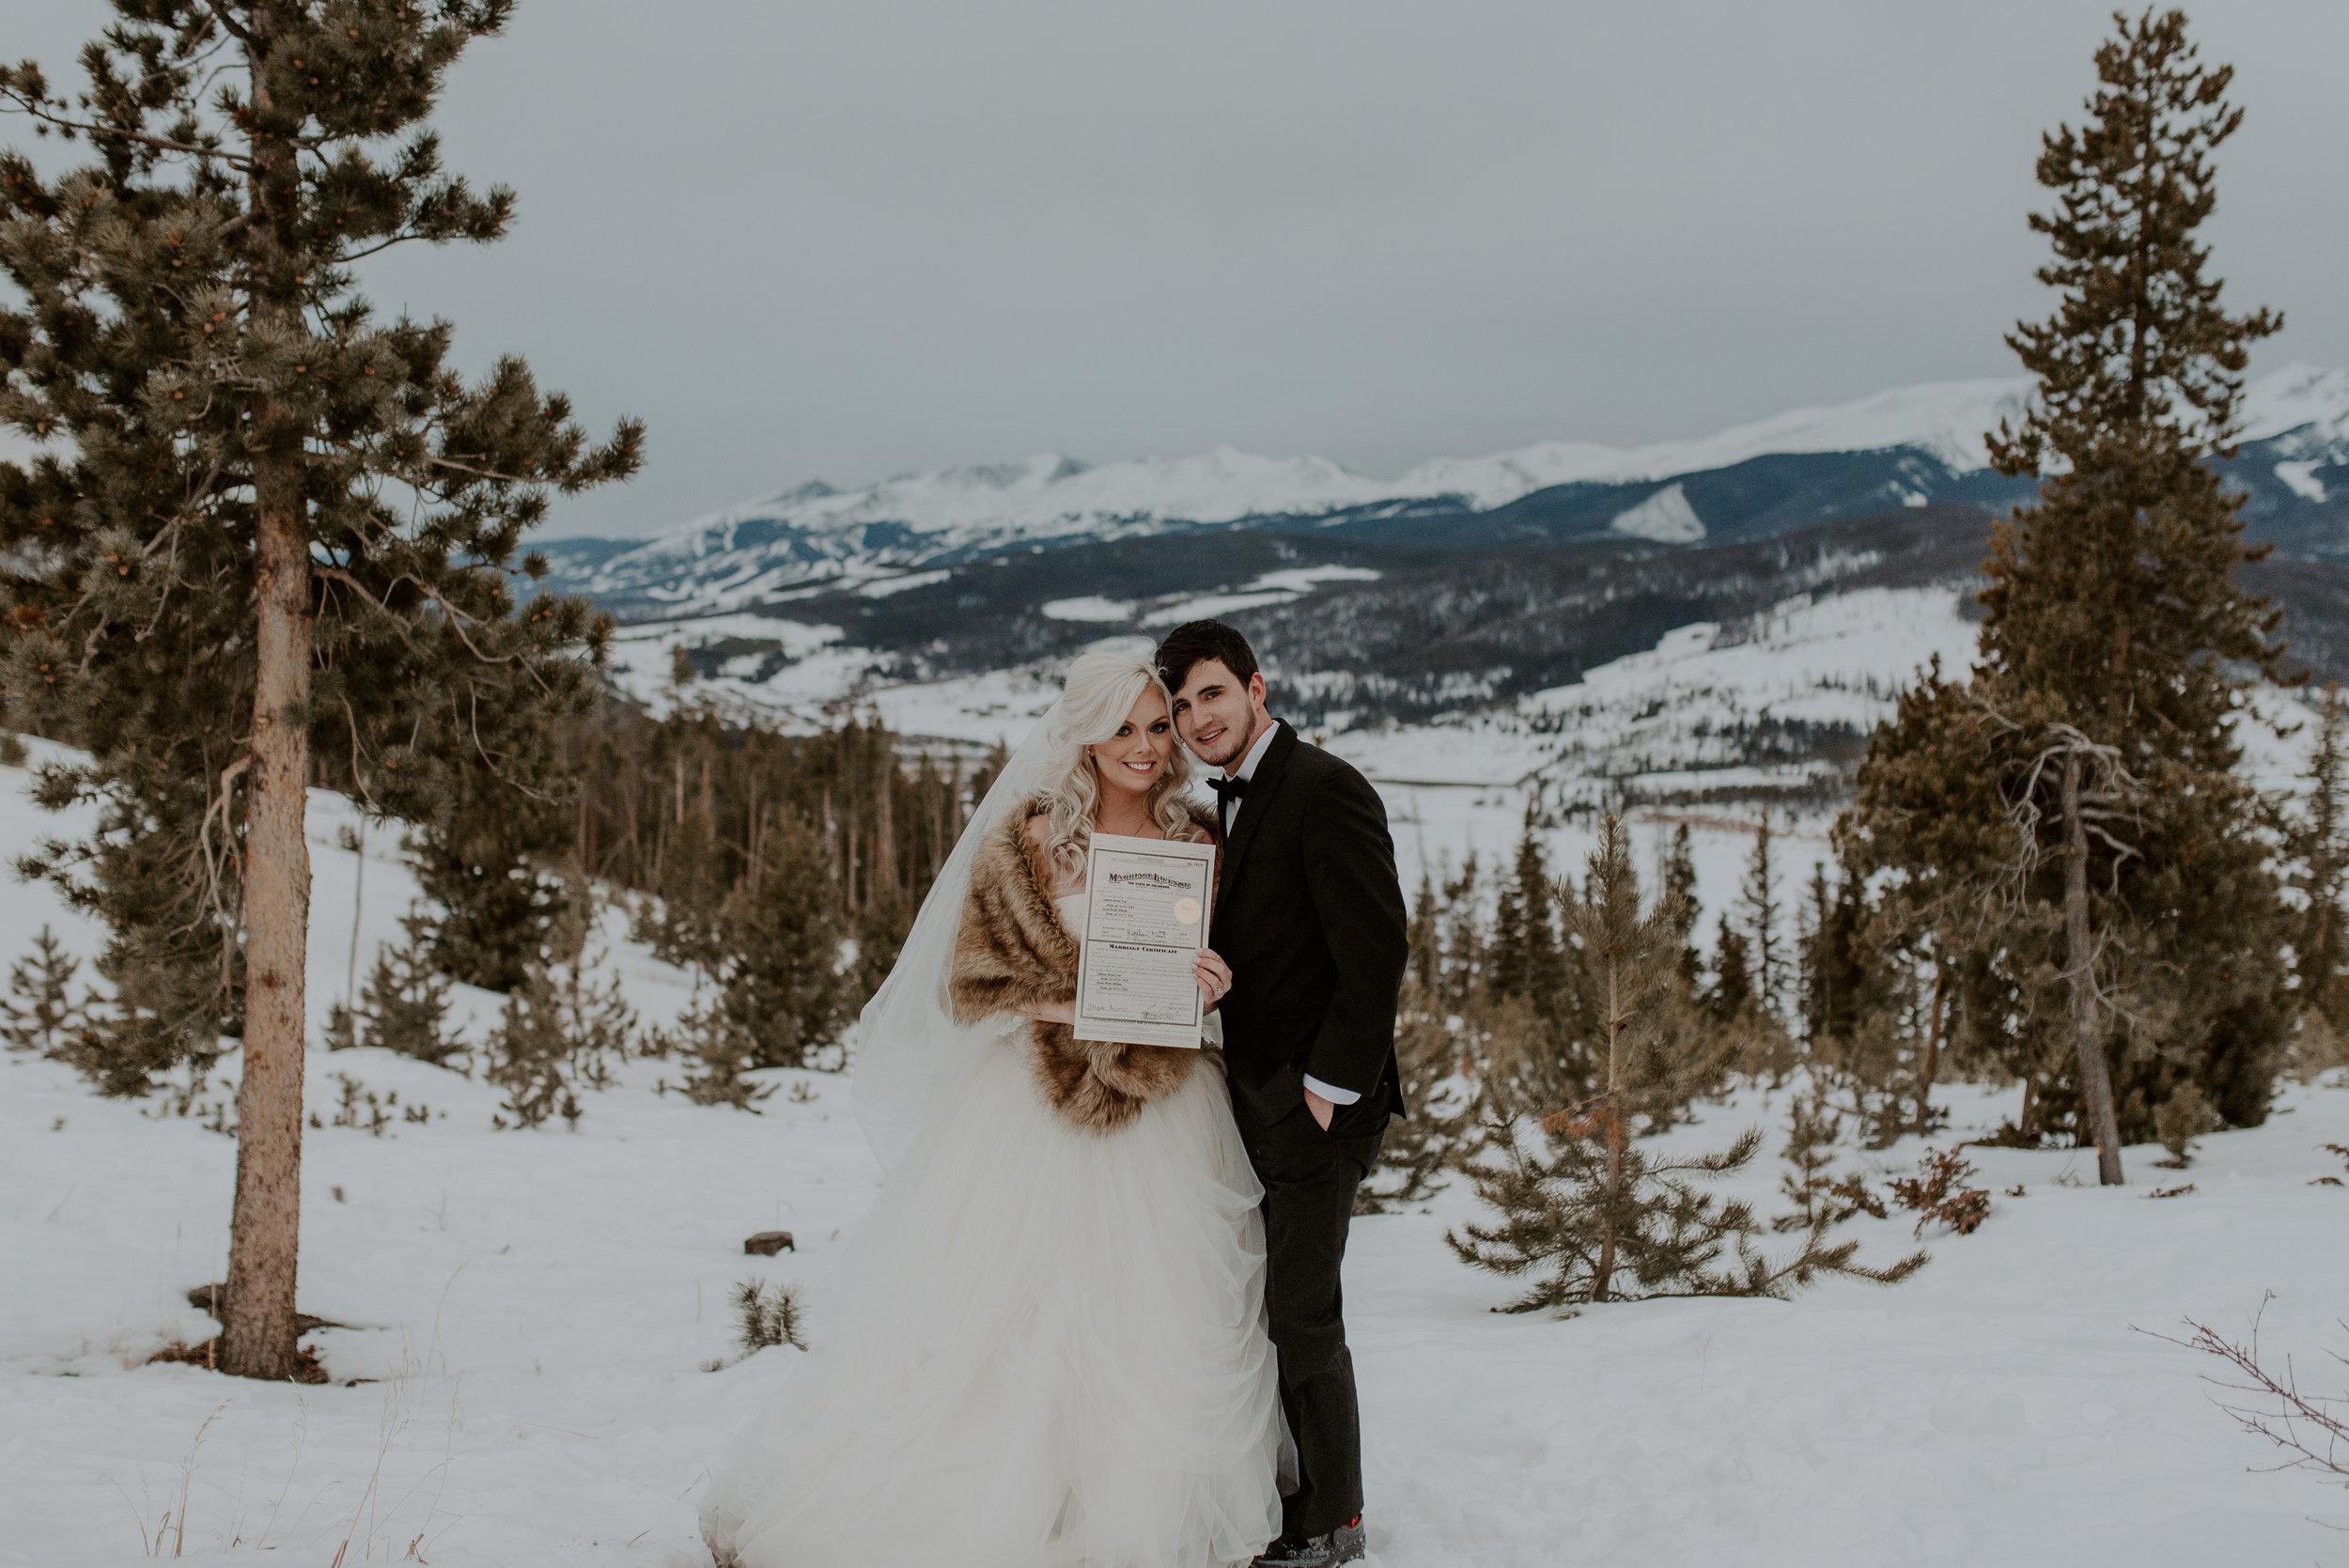 Winter wedding at Sapphire Point in Dillon, Colorado.